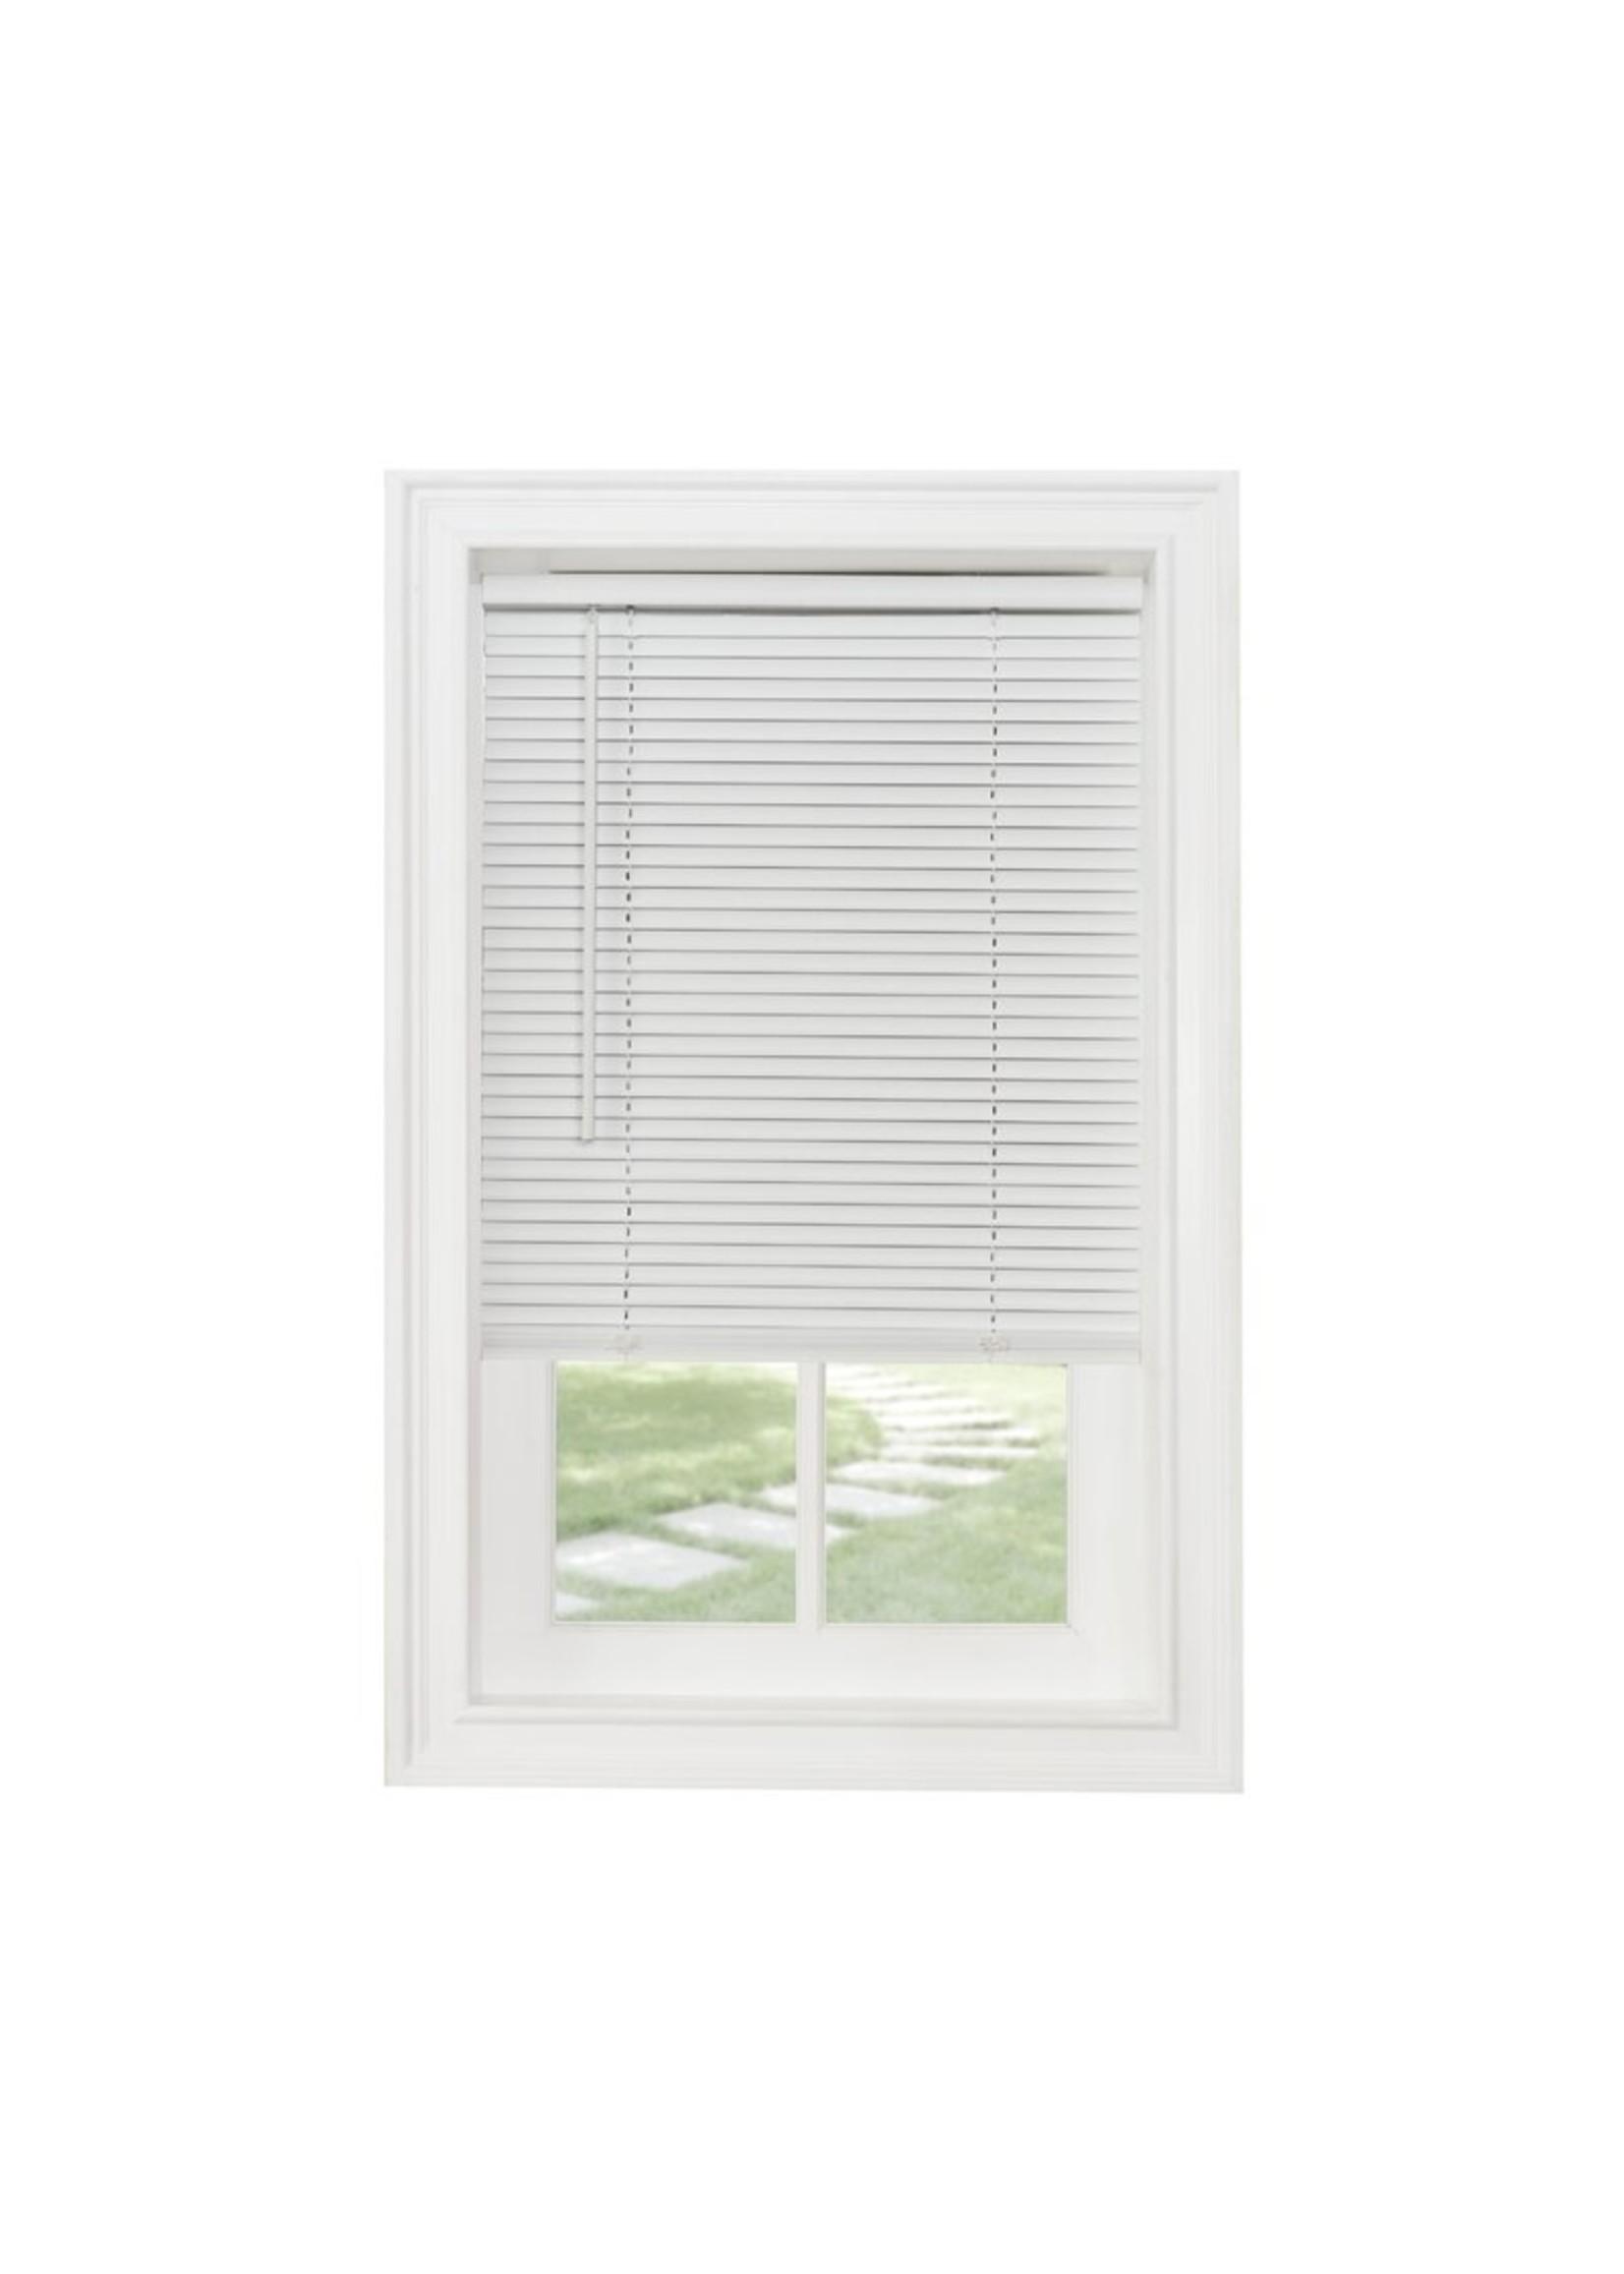 "*72"" x 64"" -  Wayfair Basics Semi-Sheer Horizontal/Venetian Blind - White - Final Sale"